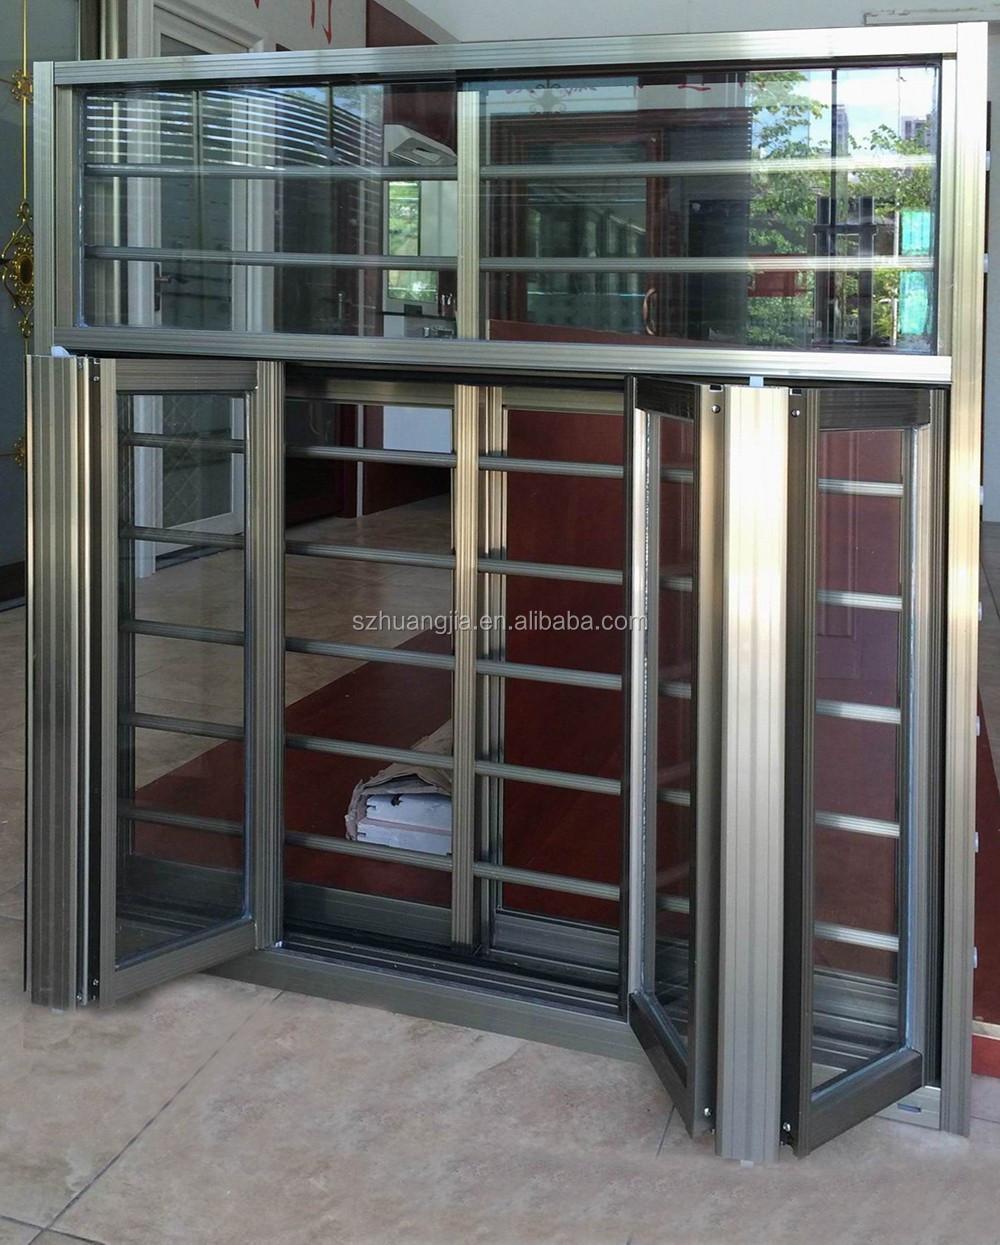 2017 Window Grills Design For Sliding Windows